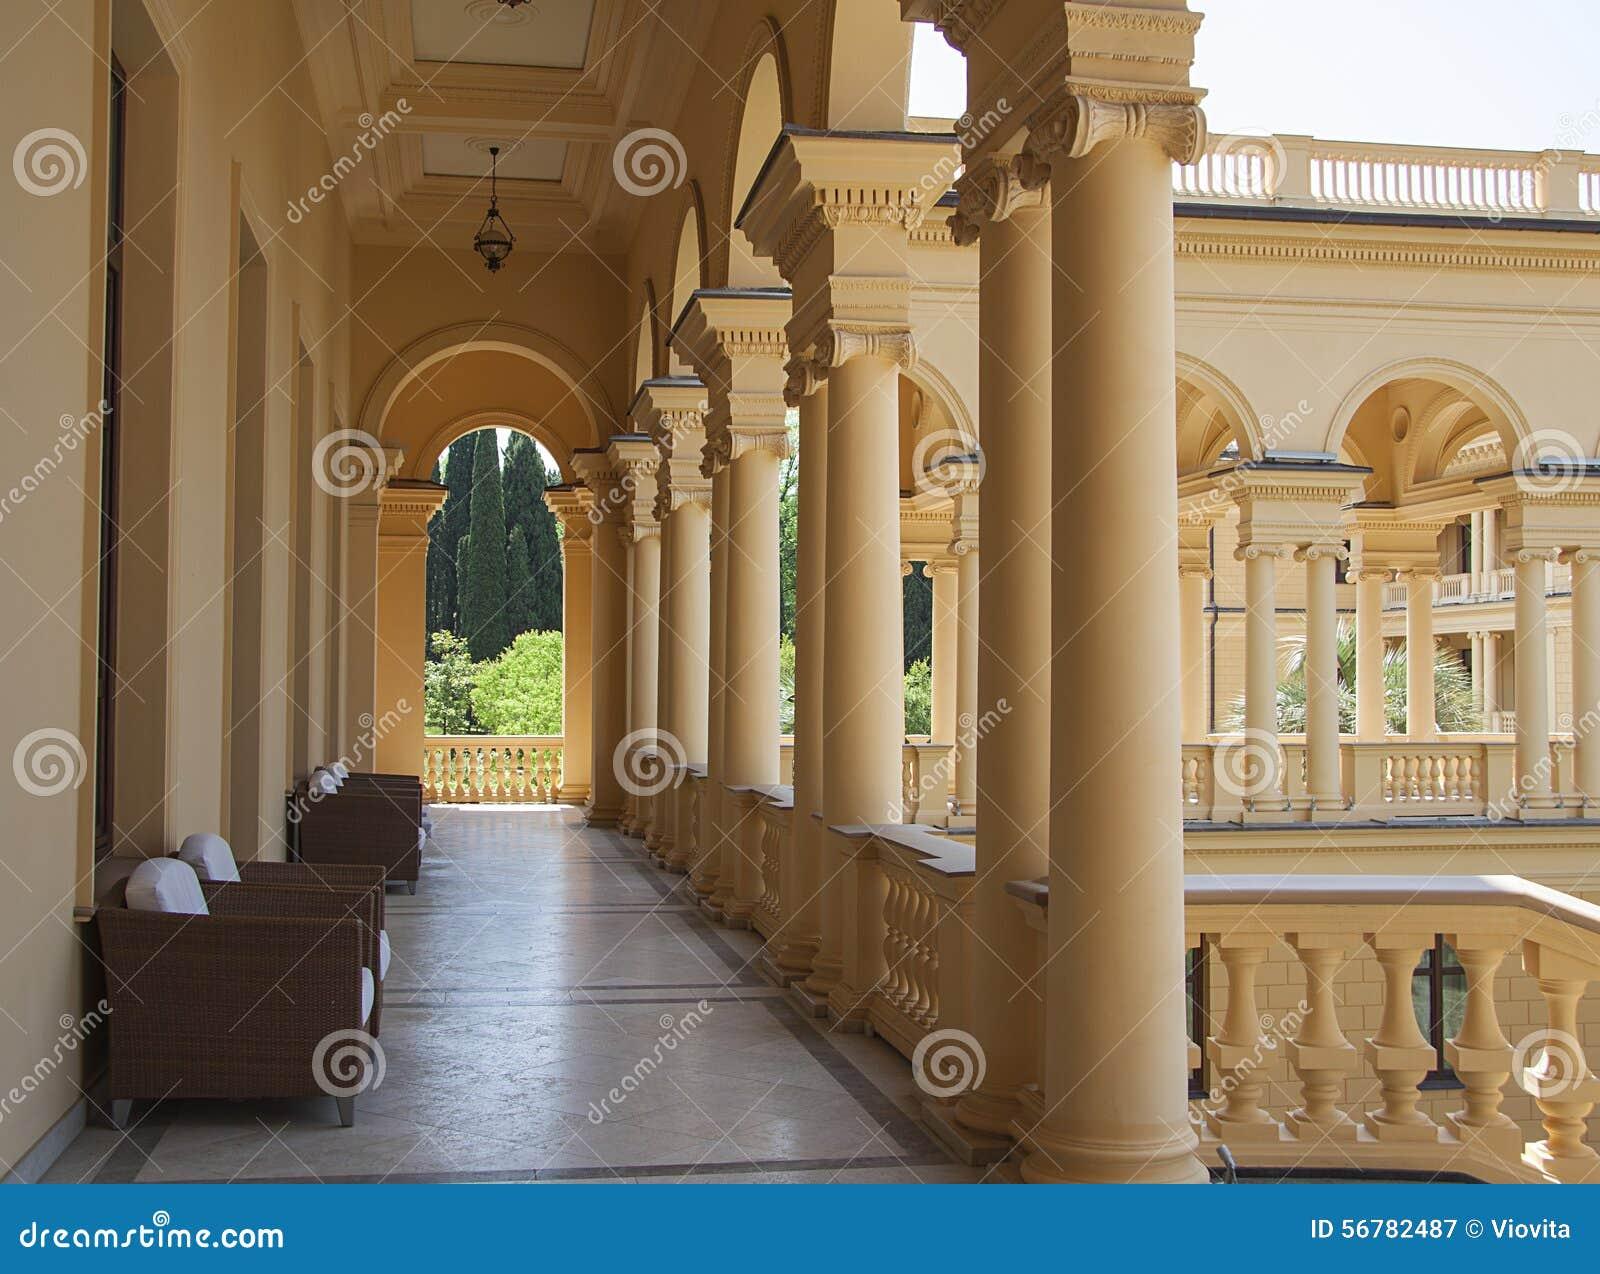 Luxury castle design in modern sanatorium